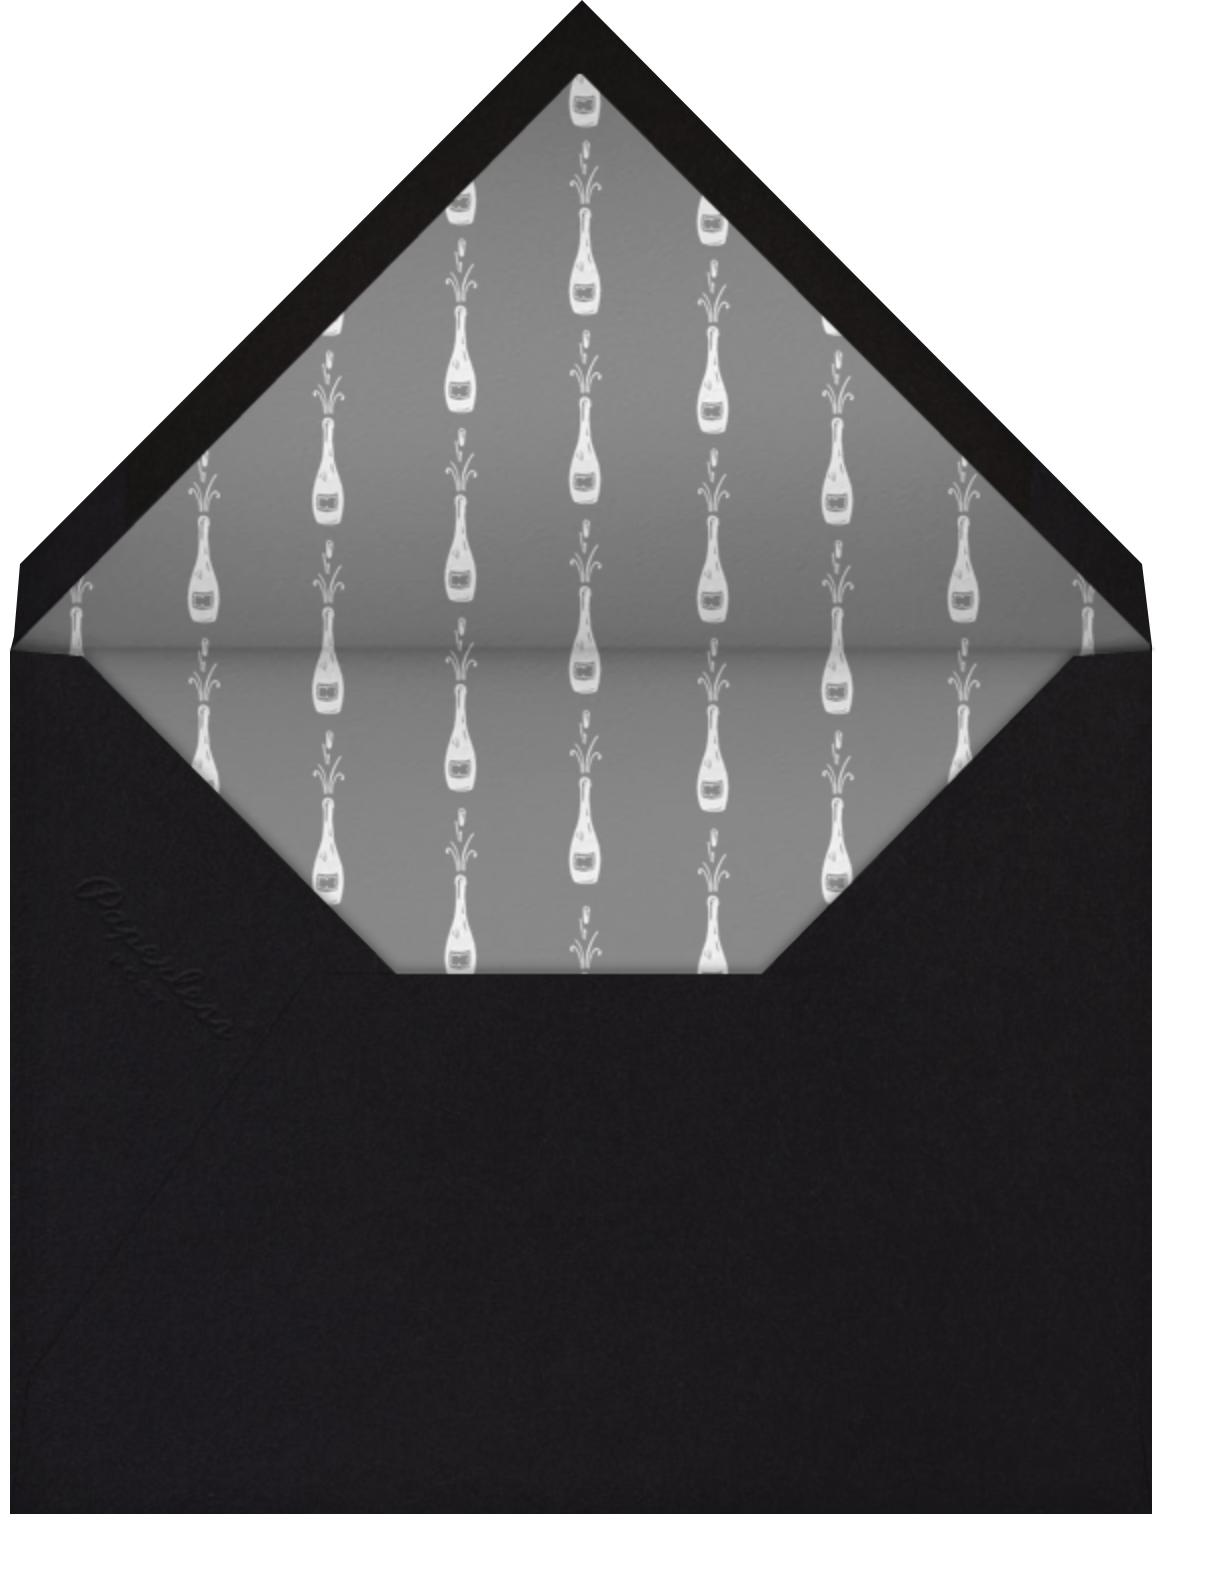 Champagne Glasses - Paperless Post - Envelope